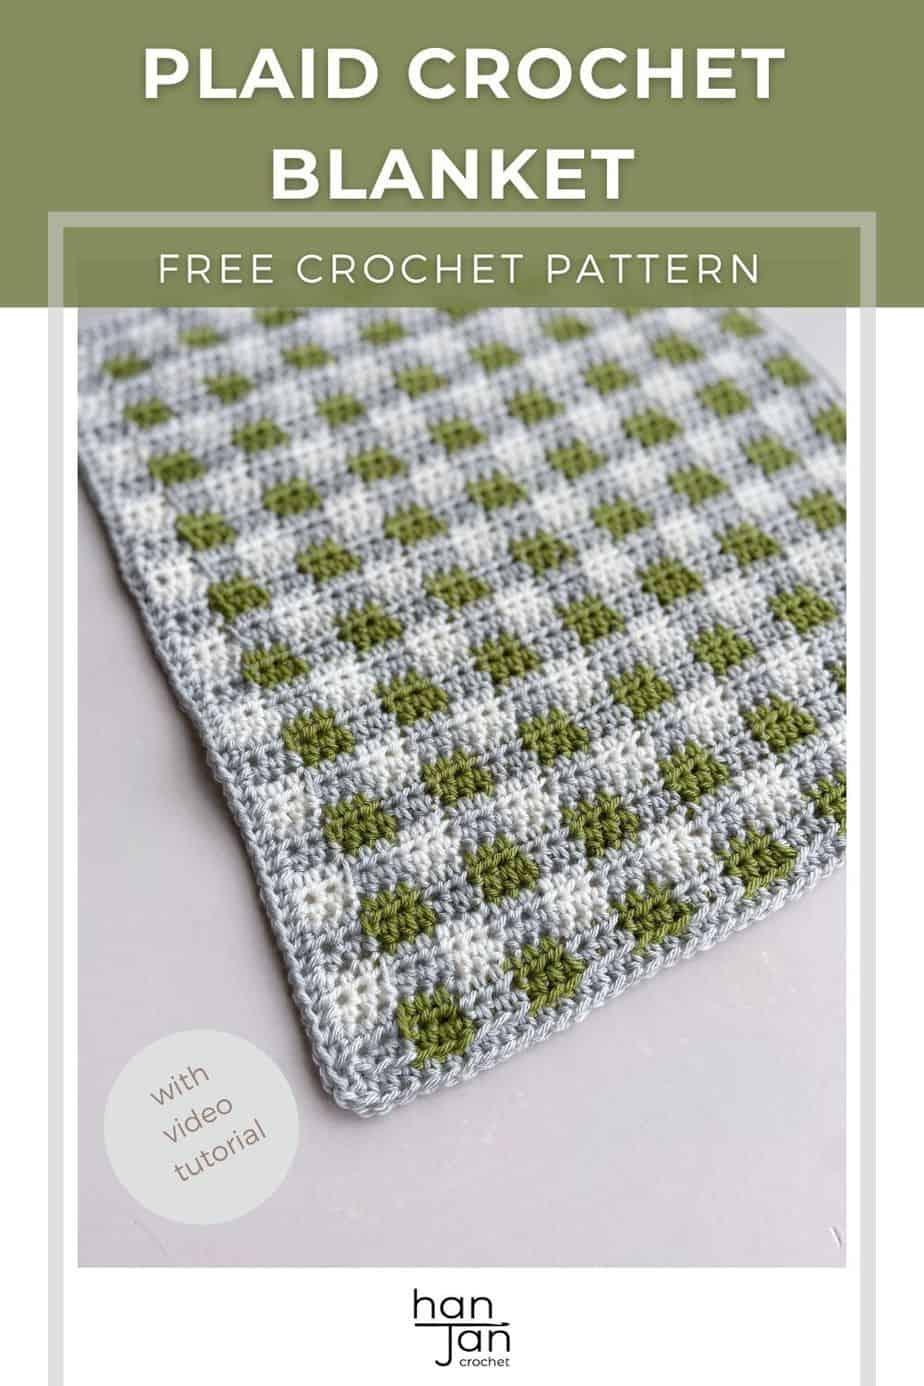 plaid crochet blanket pattern shown in modern gender neutral grey, white and green